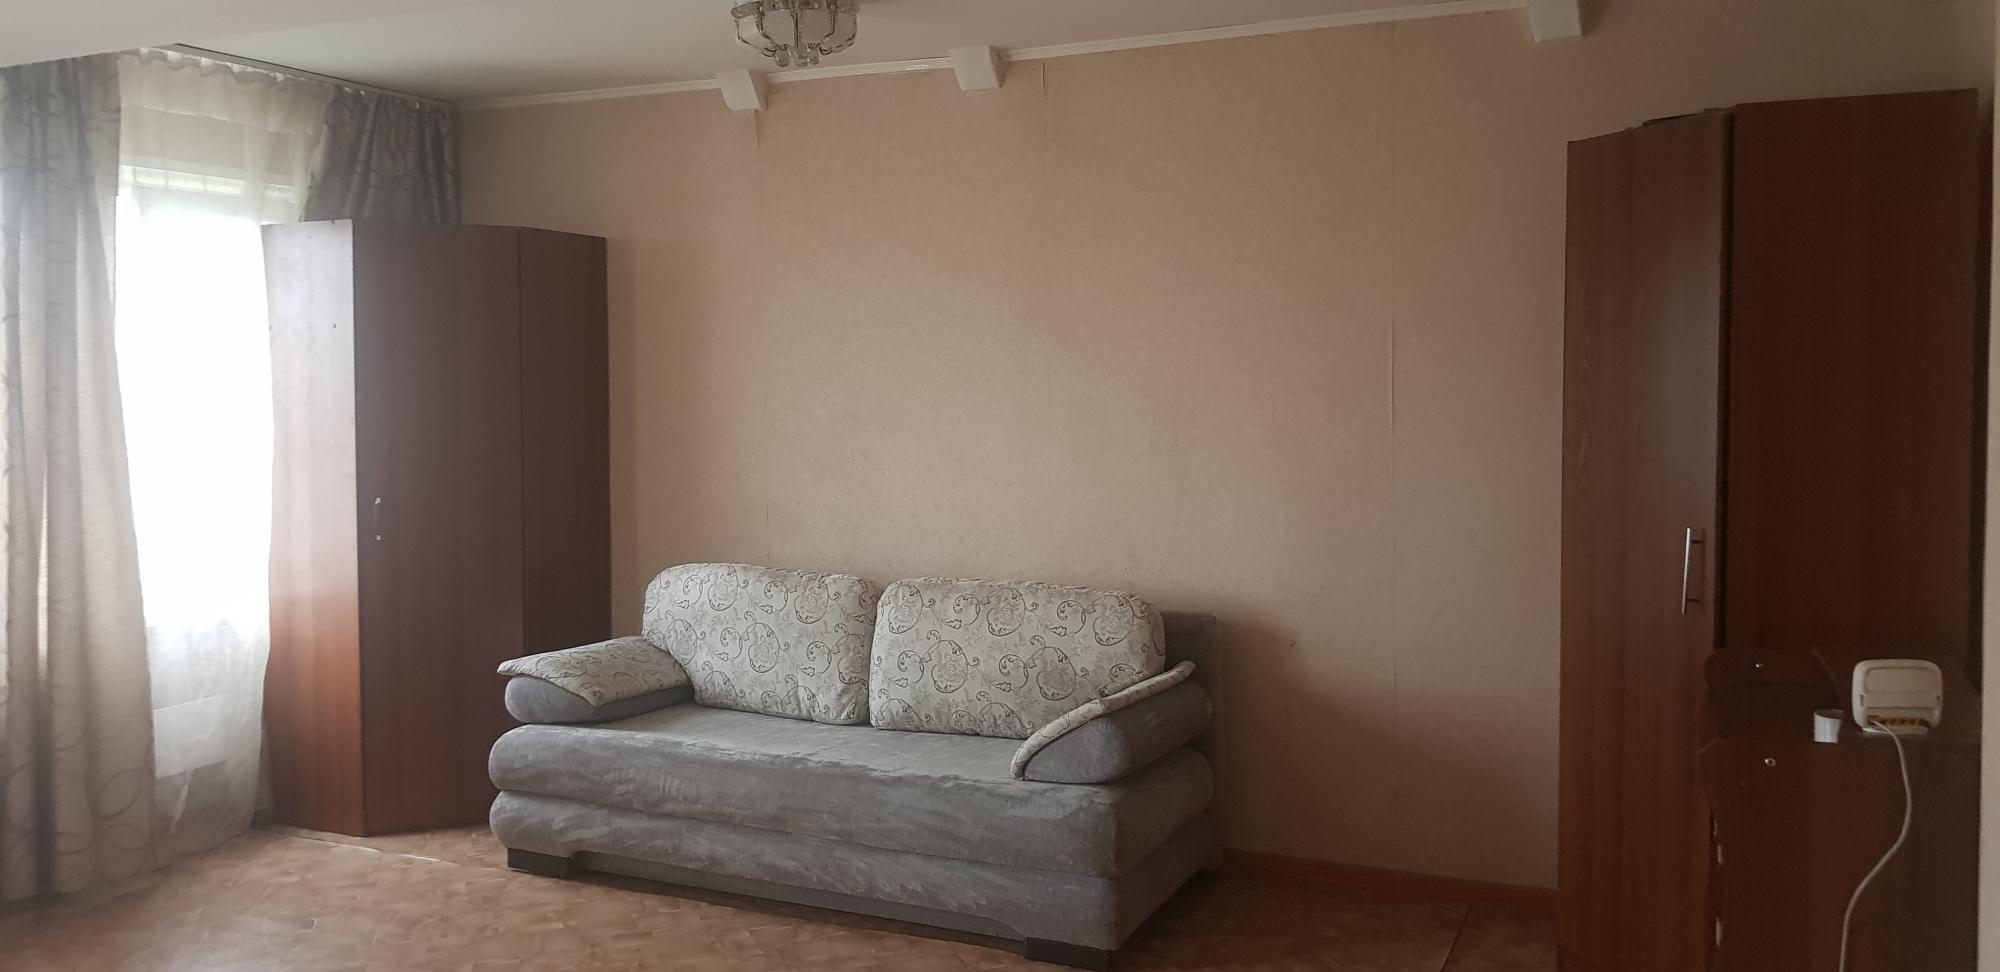 2к квартира улица Краснодарская, 3 | 18000 | аренда в Красноярске фото 10